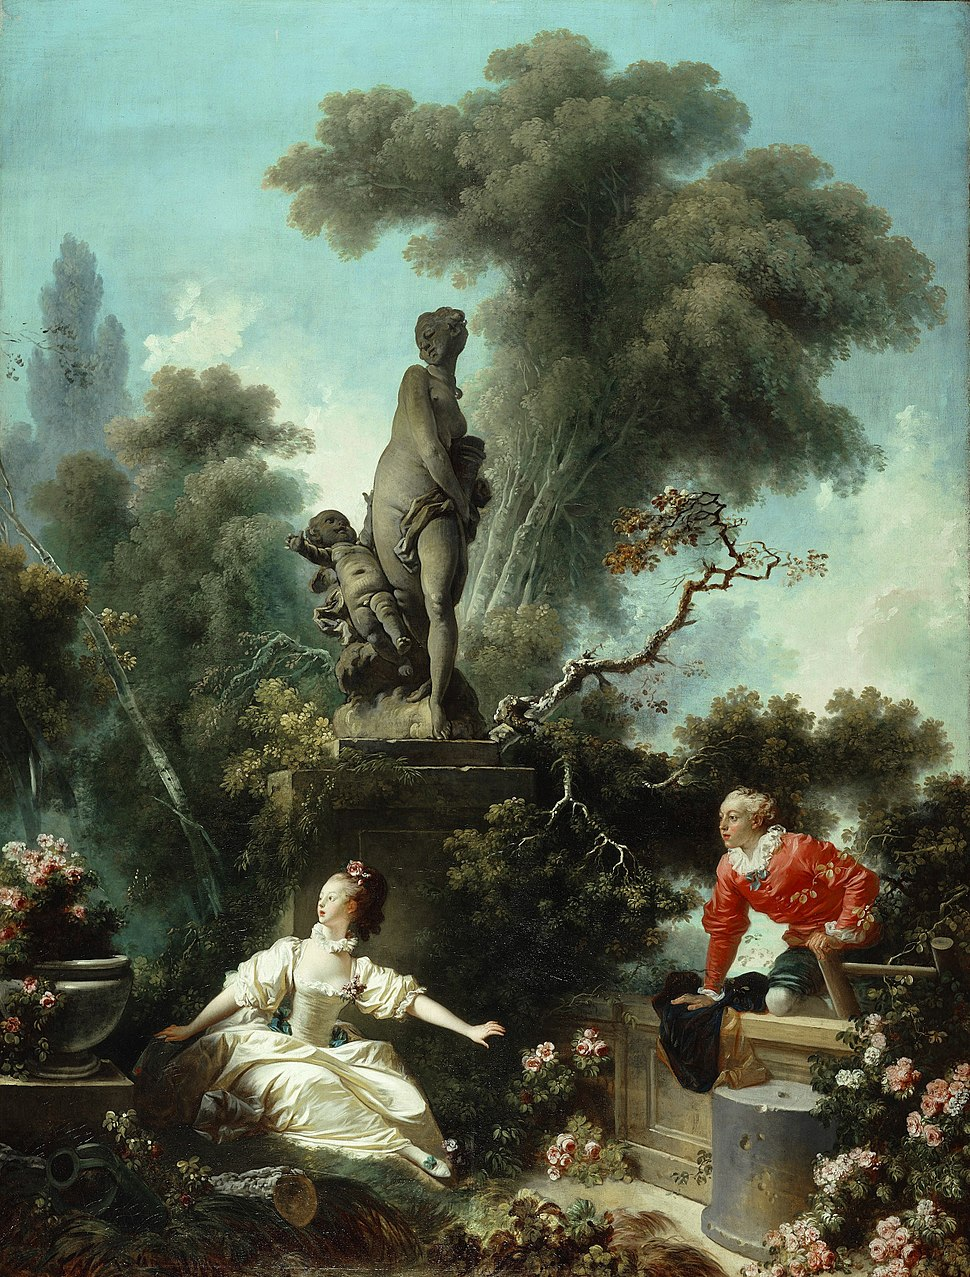 The Progress of Love - The Meeting - Fragonard 1771-72